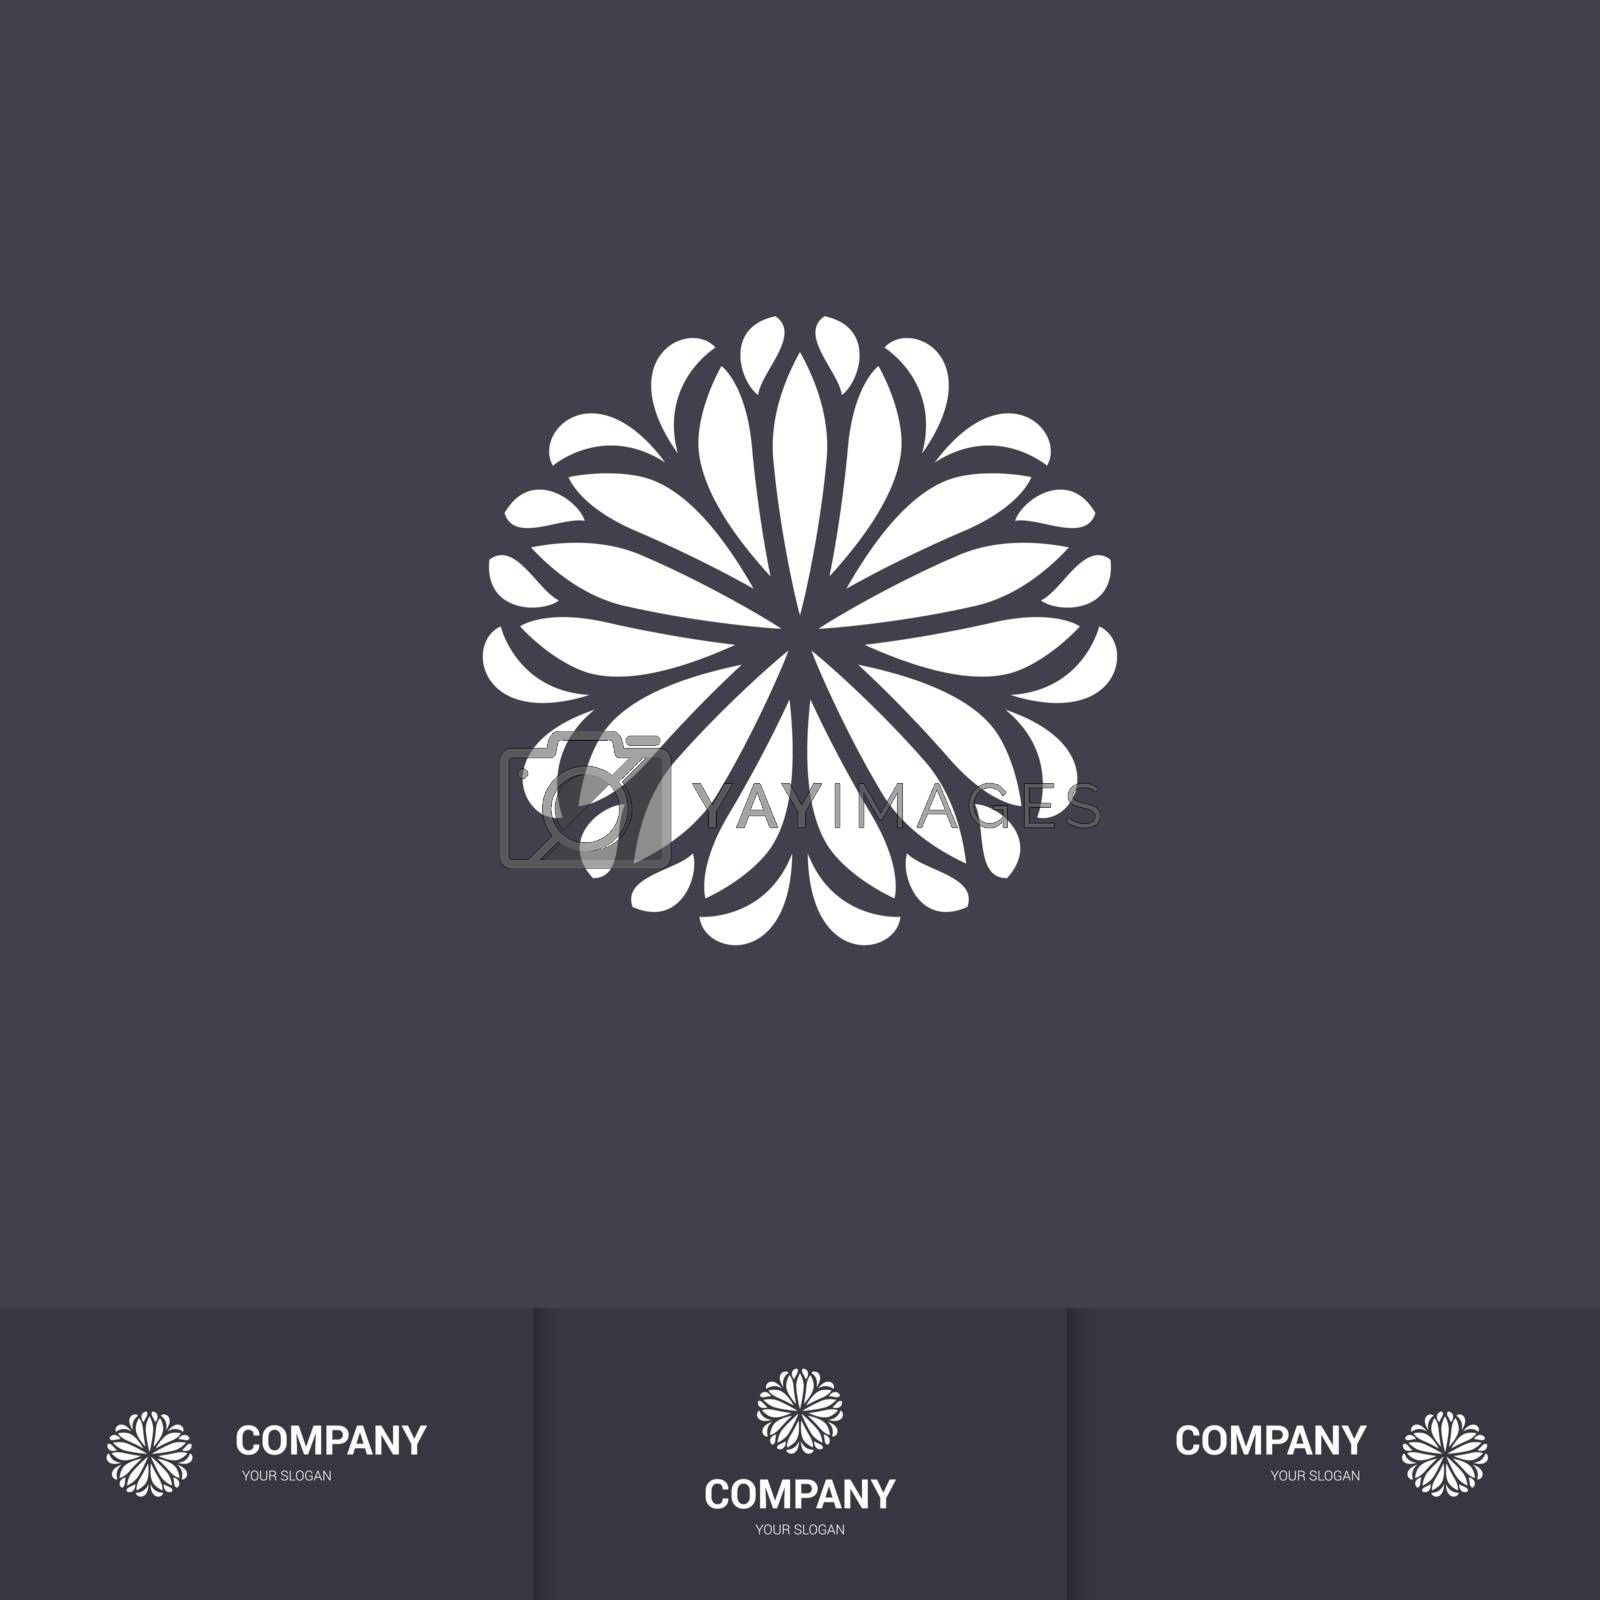 Abstract Floral Geometric Element for Circular Logo. Company Mark, Emblem. Simple Geometric Mandala Logotype on Dark Background